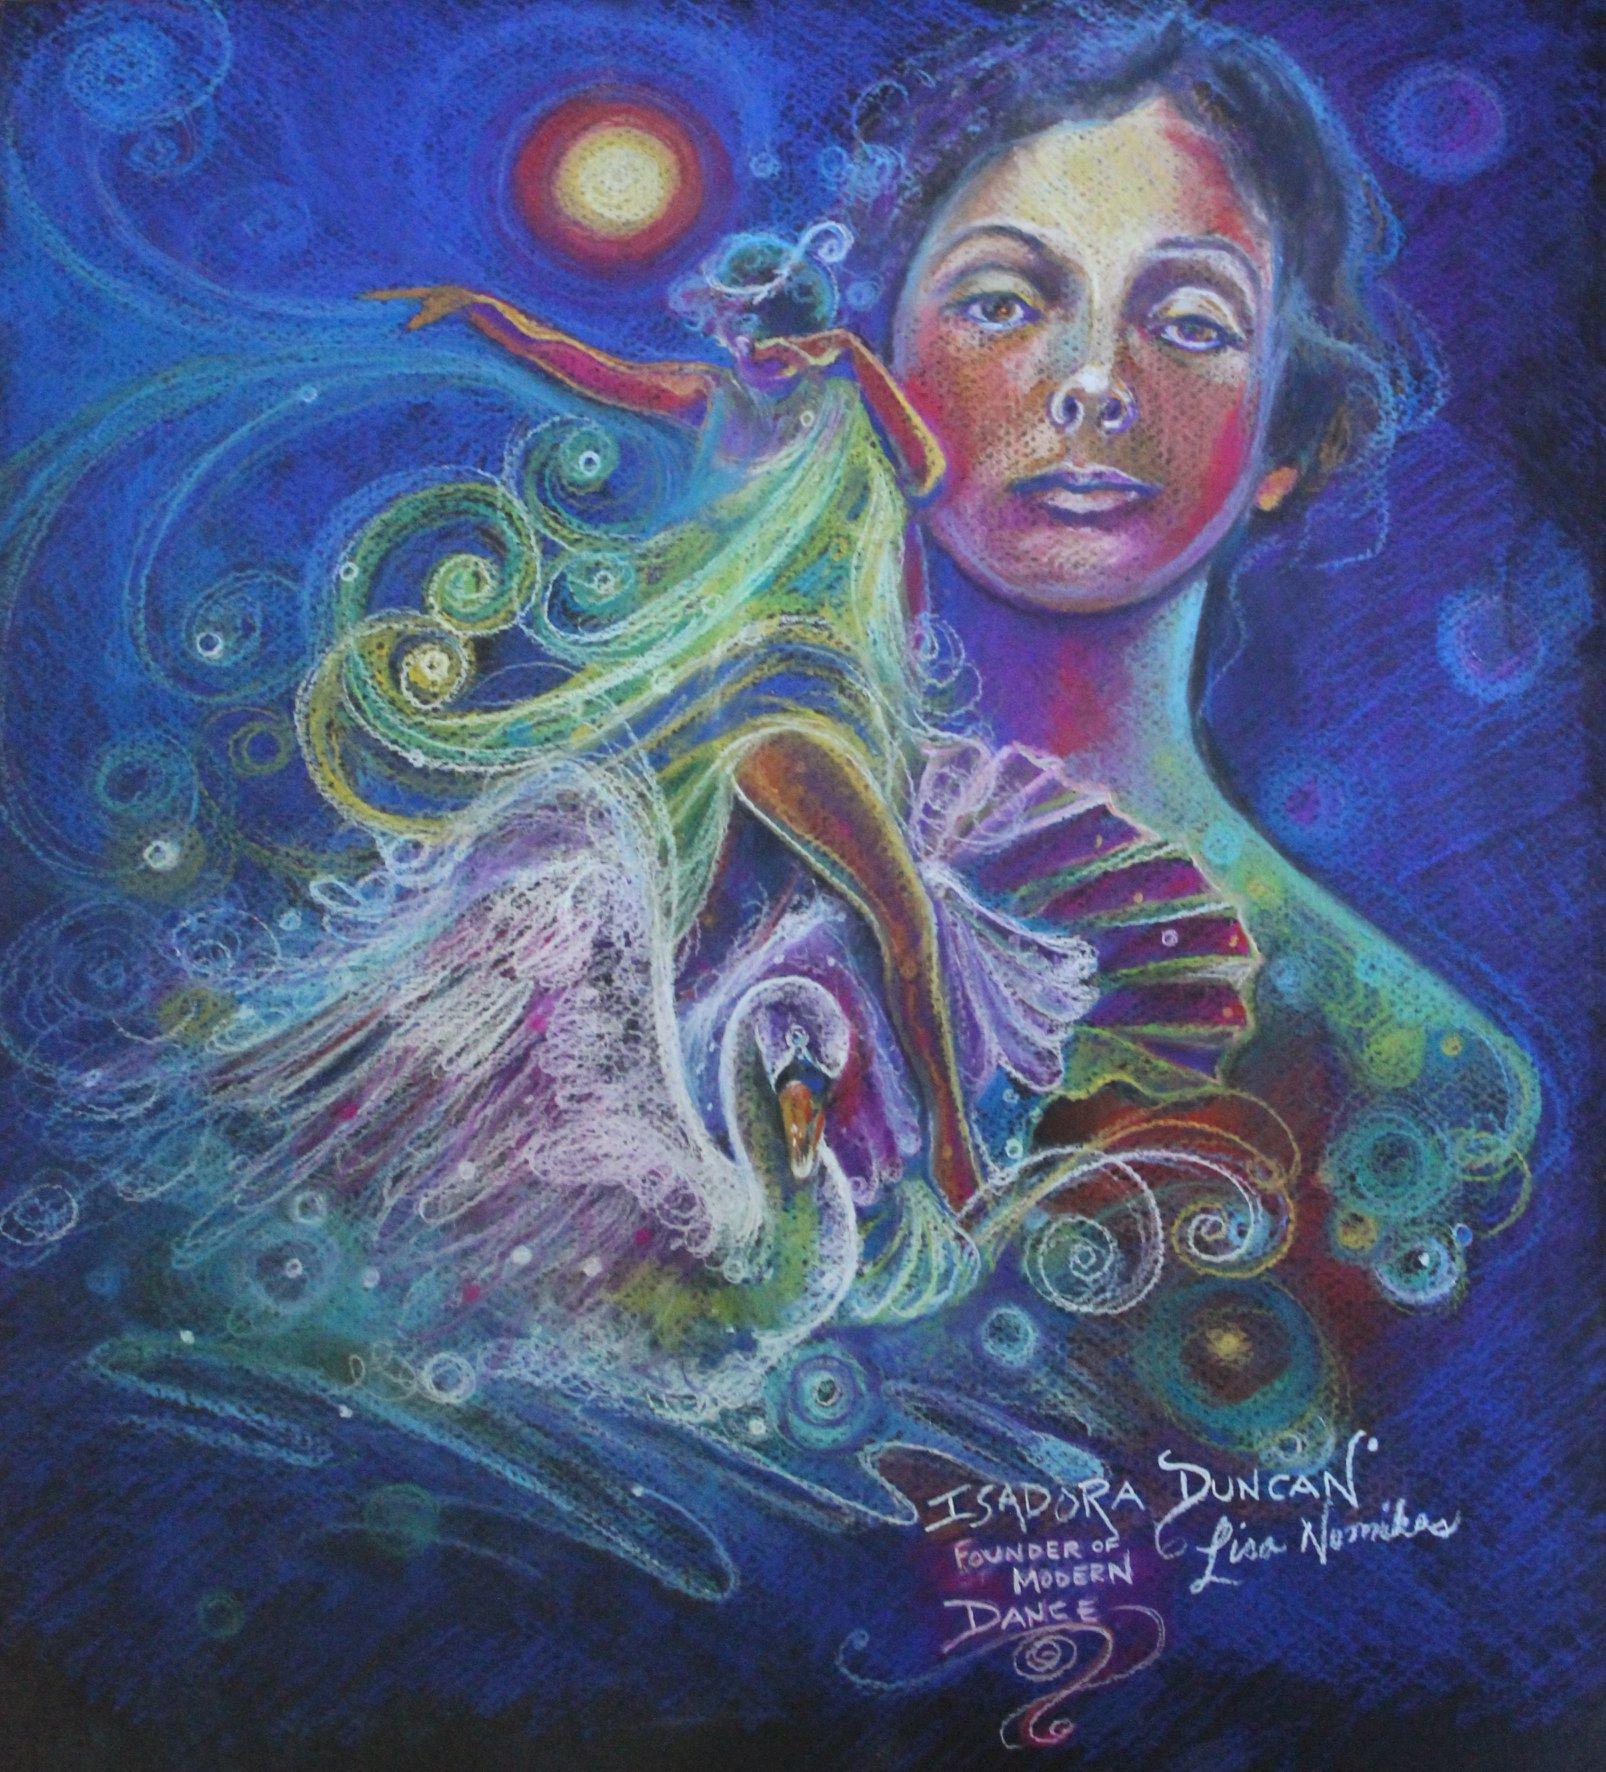 Isadora Duncan, by Lisa Nomikos